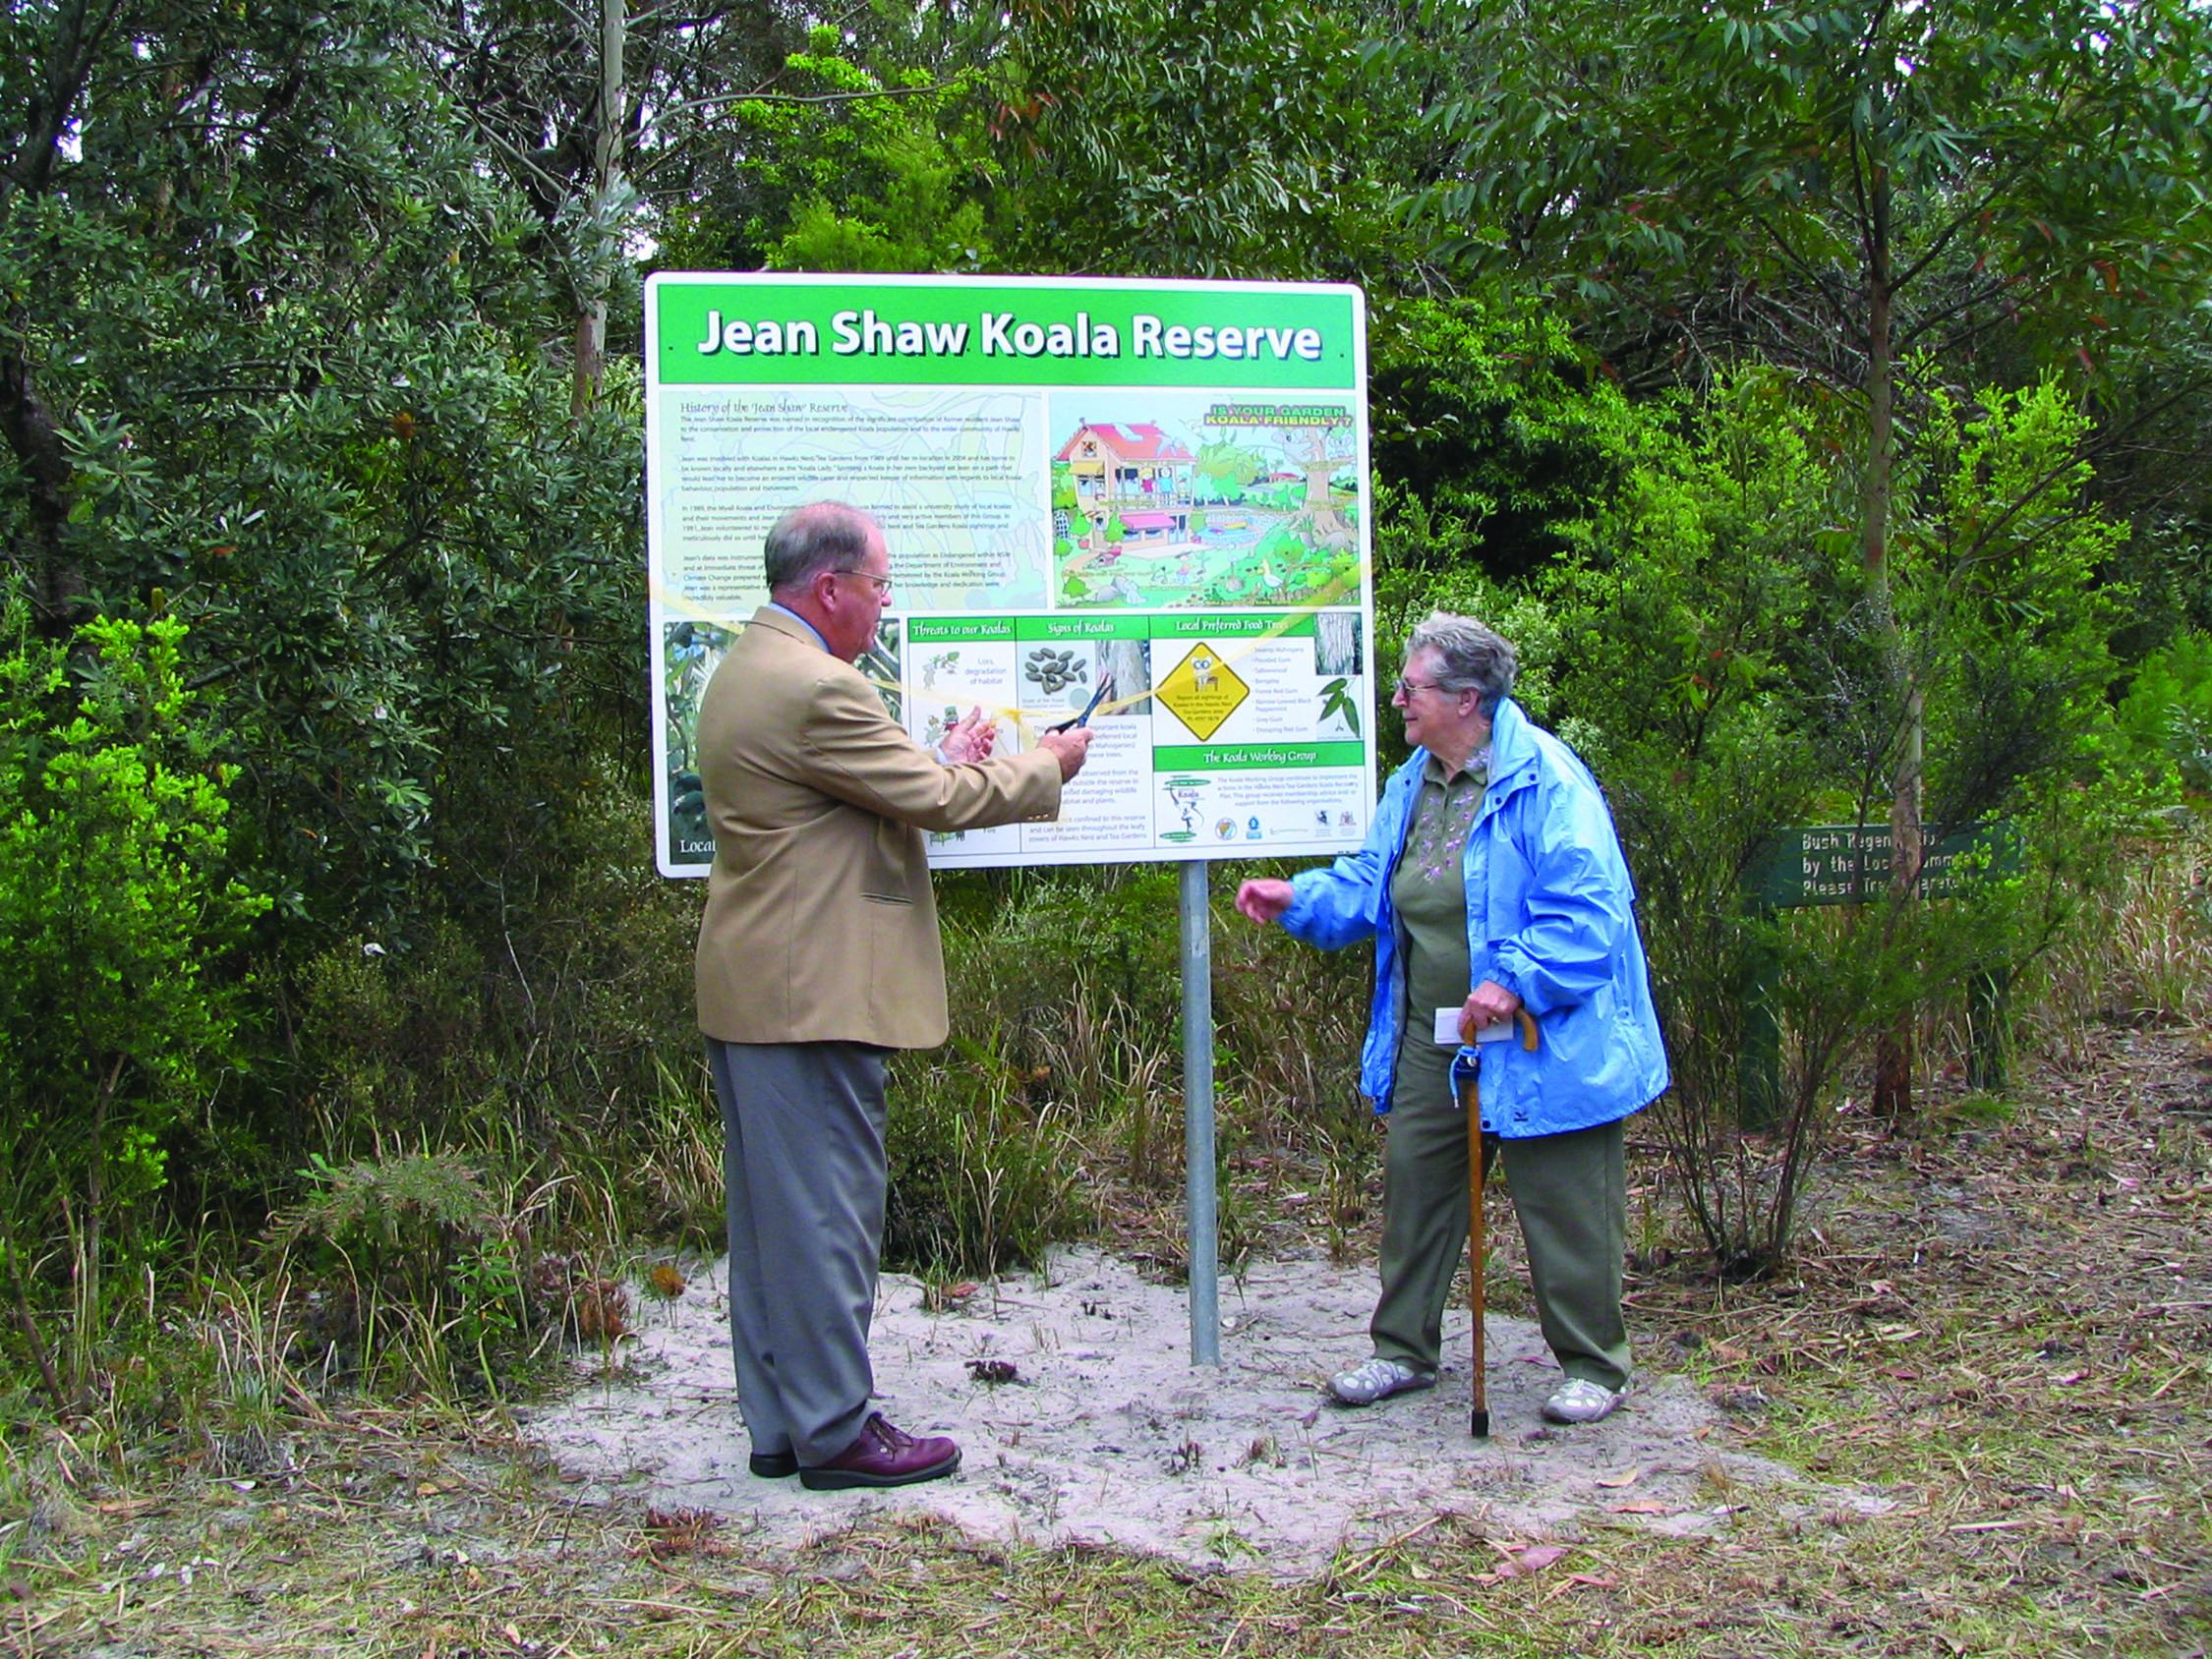 : Former GLC Mayor John Chadban and Jean Shaw at the Koala Reserve Dedication in 2007.